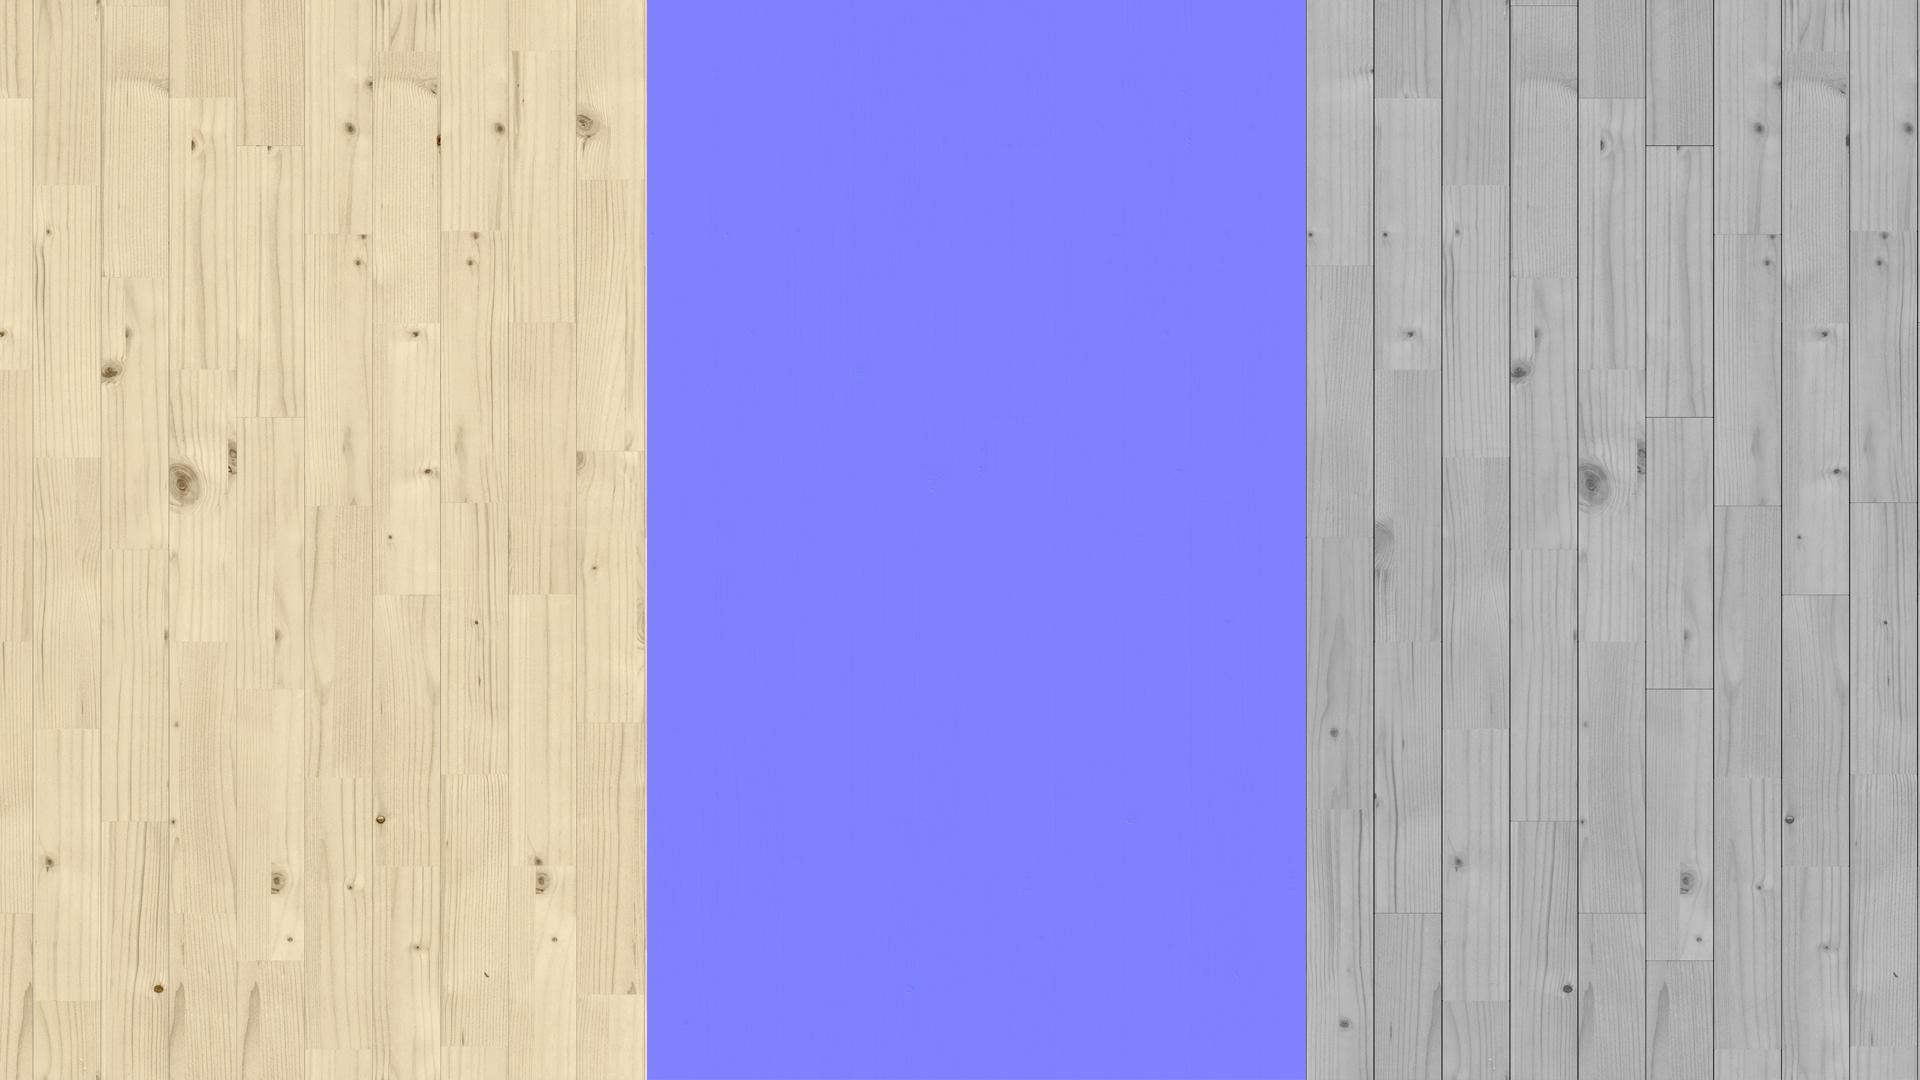 Natural spruce planks